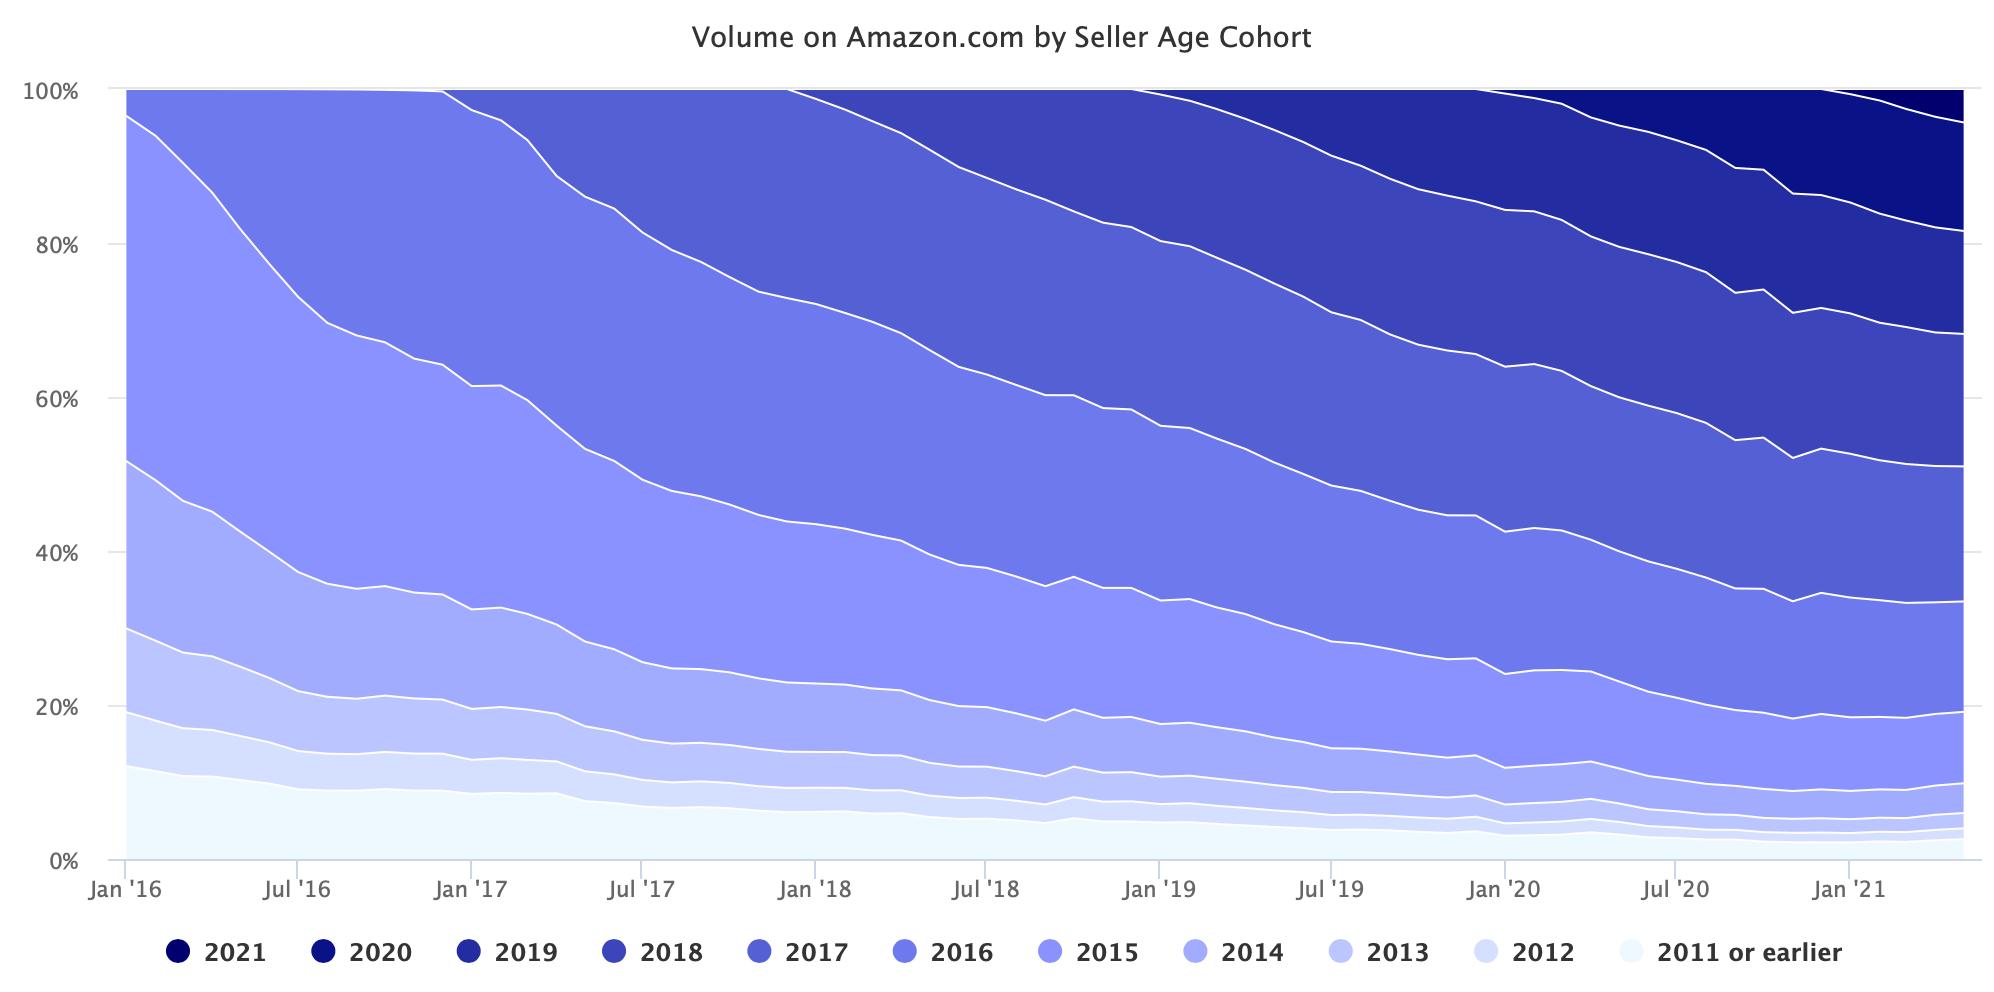 Volume na Amazon.com por Seller Age Cohort